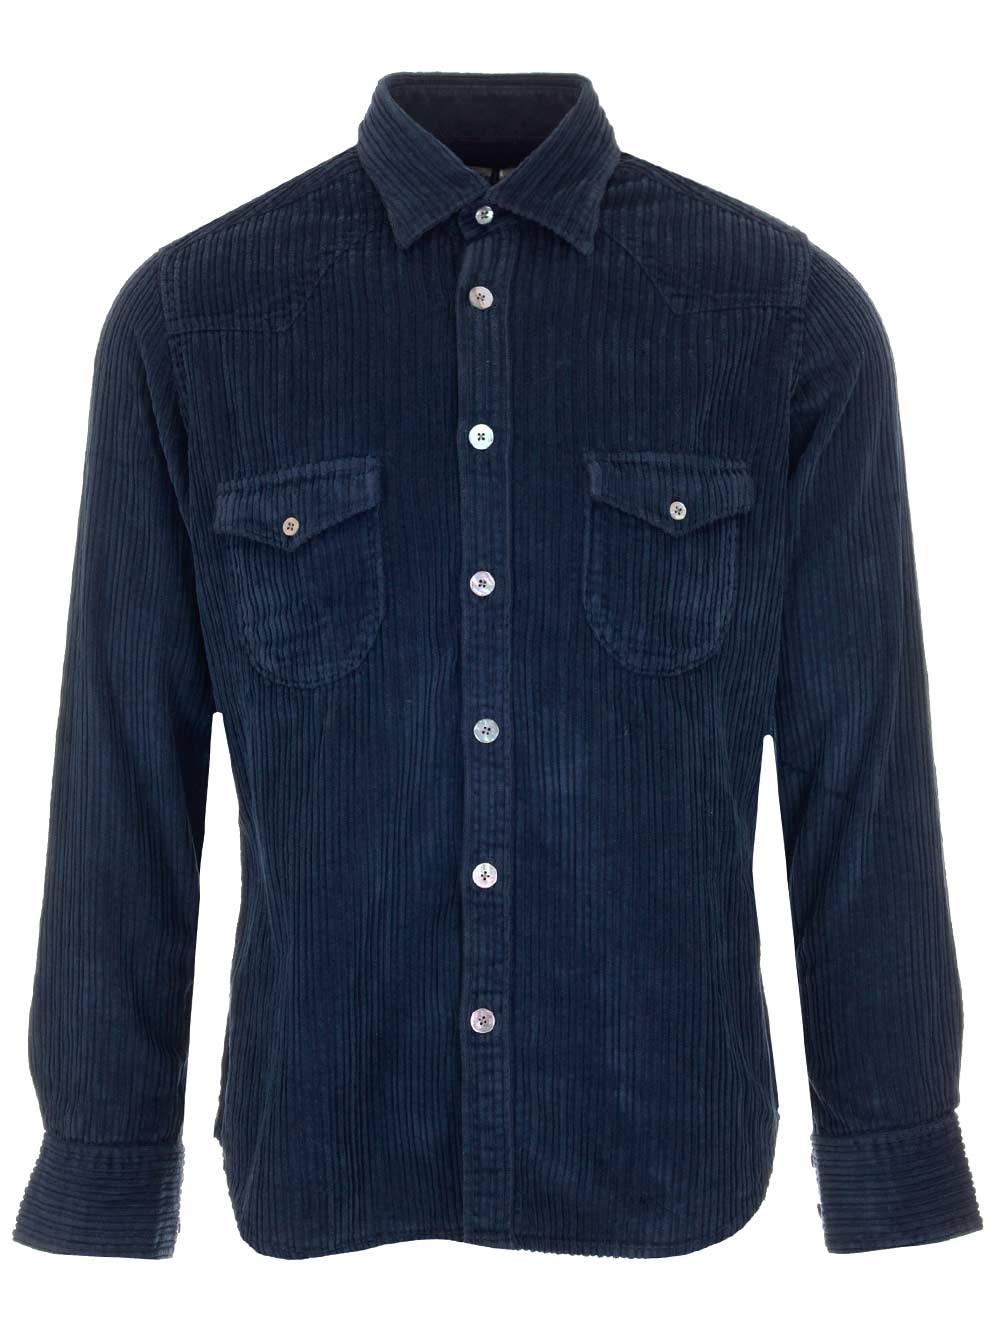 AL DUCA D'AOSTA 1902 Corduroy Casual Shirt